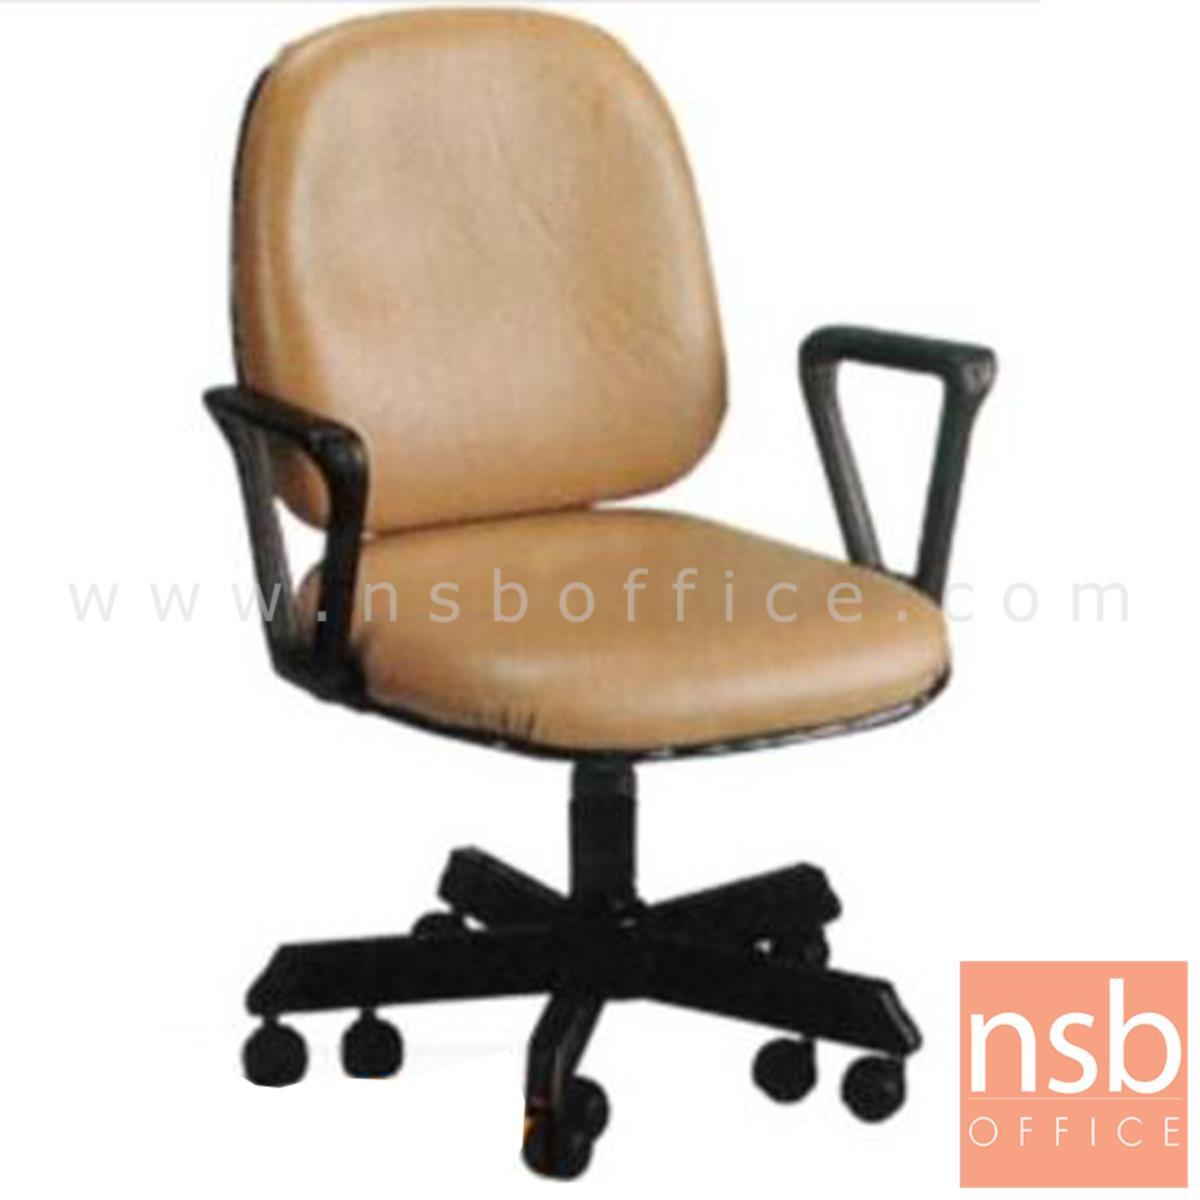 B14A019:เก้าอี้สำนักงาน รุ่น Stoffer  ขาเหล็ก 10 ล้อ